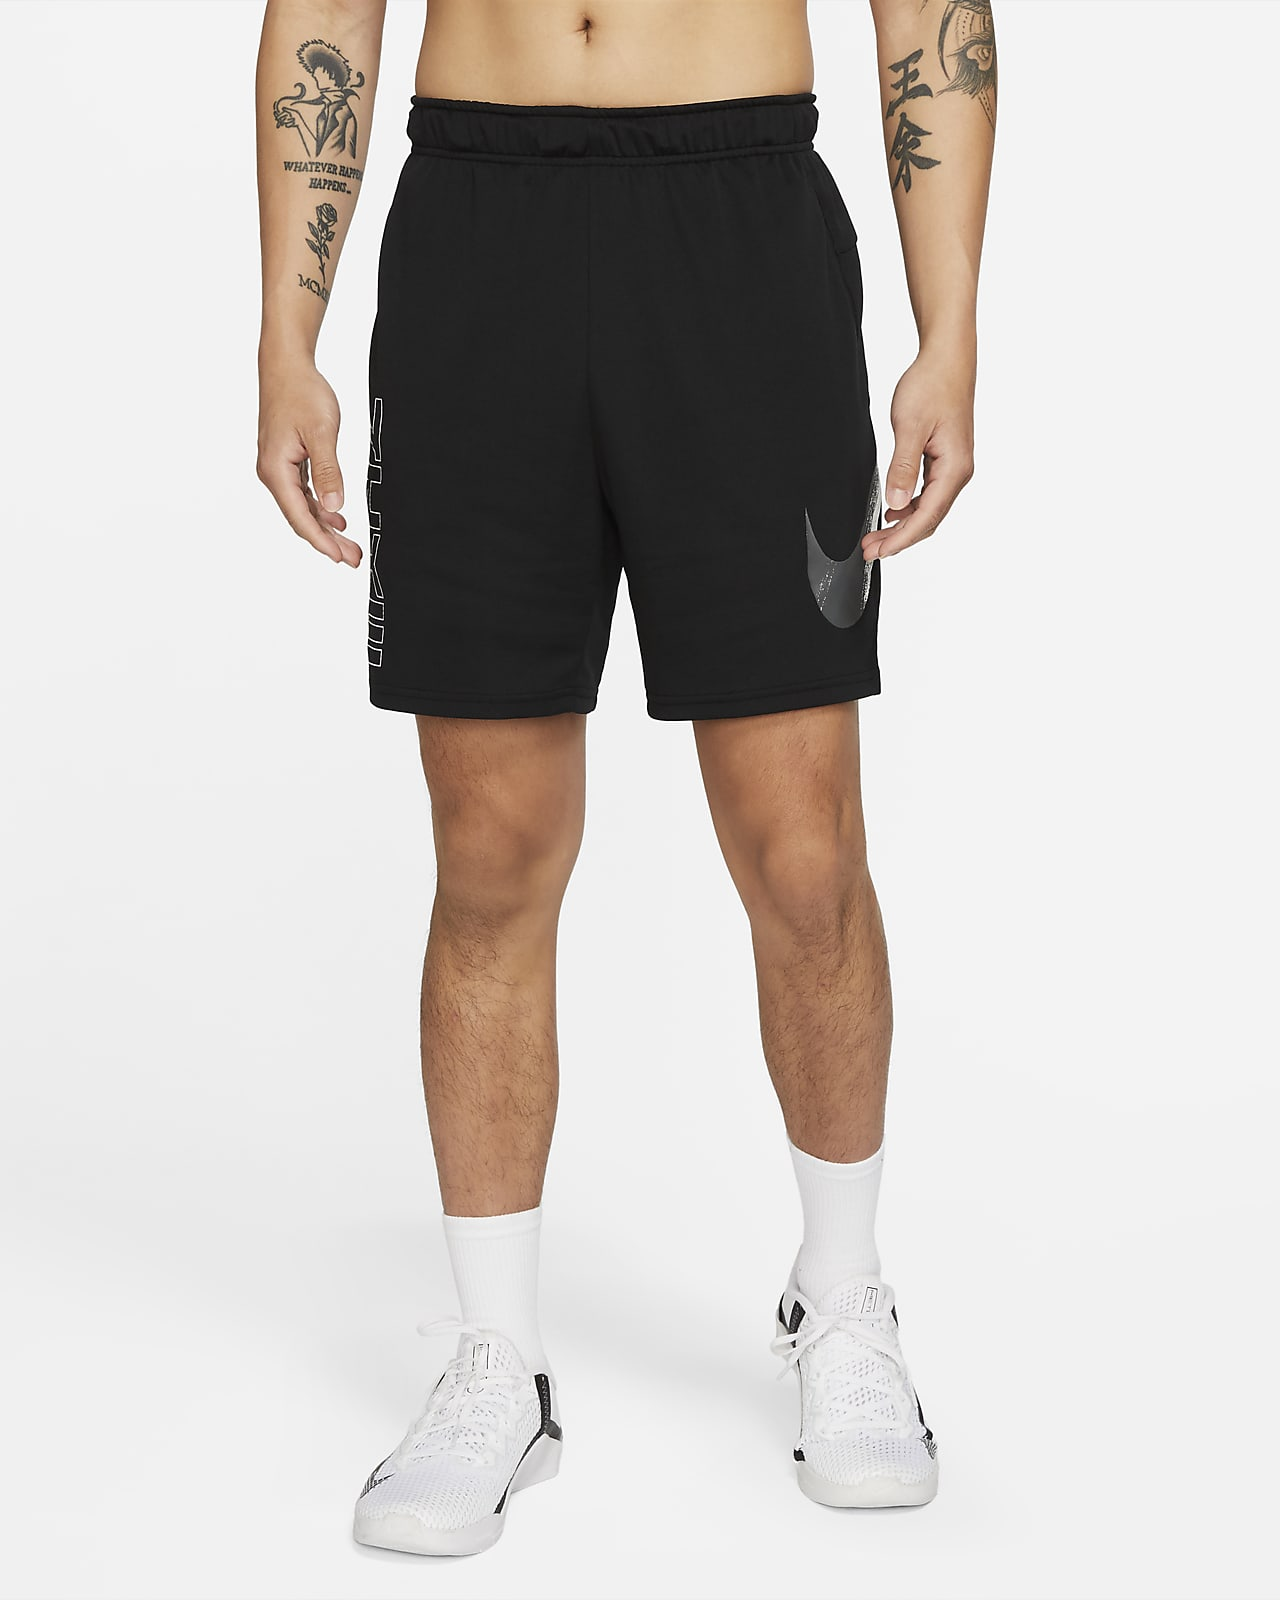 Nike Dri-FIT Sport Clash 男子针织训练短裤